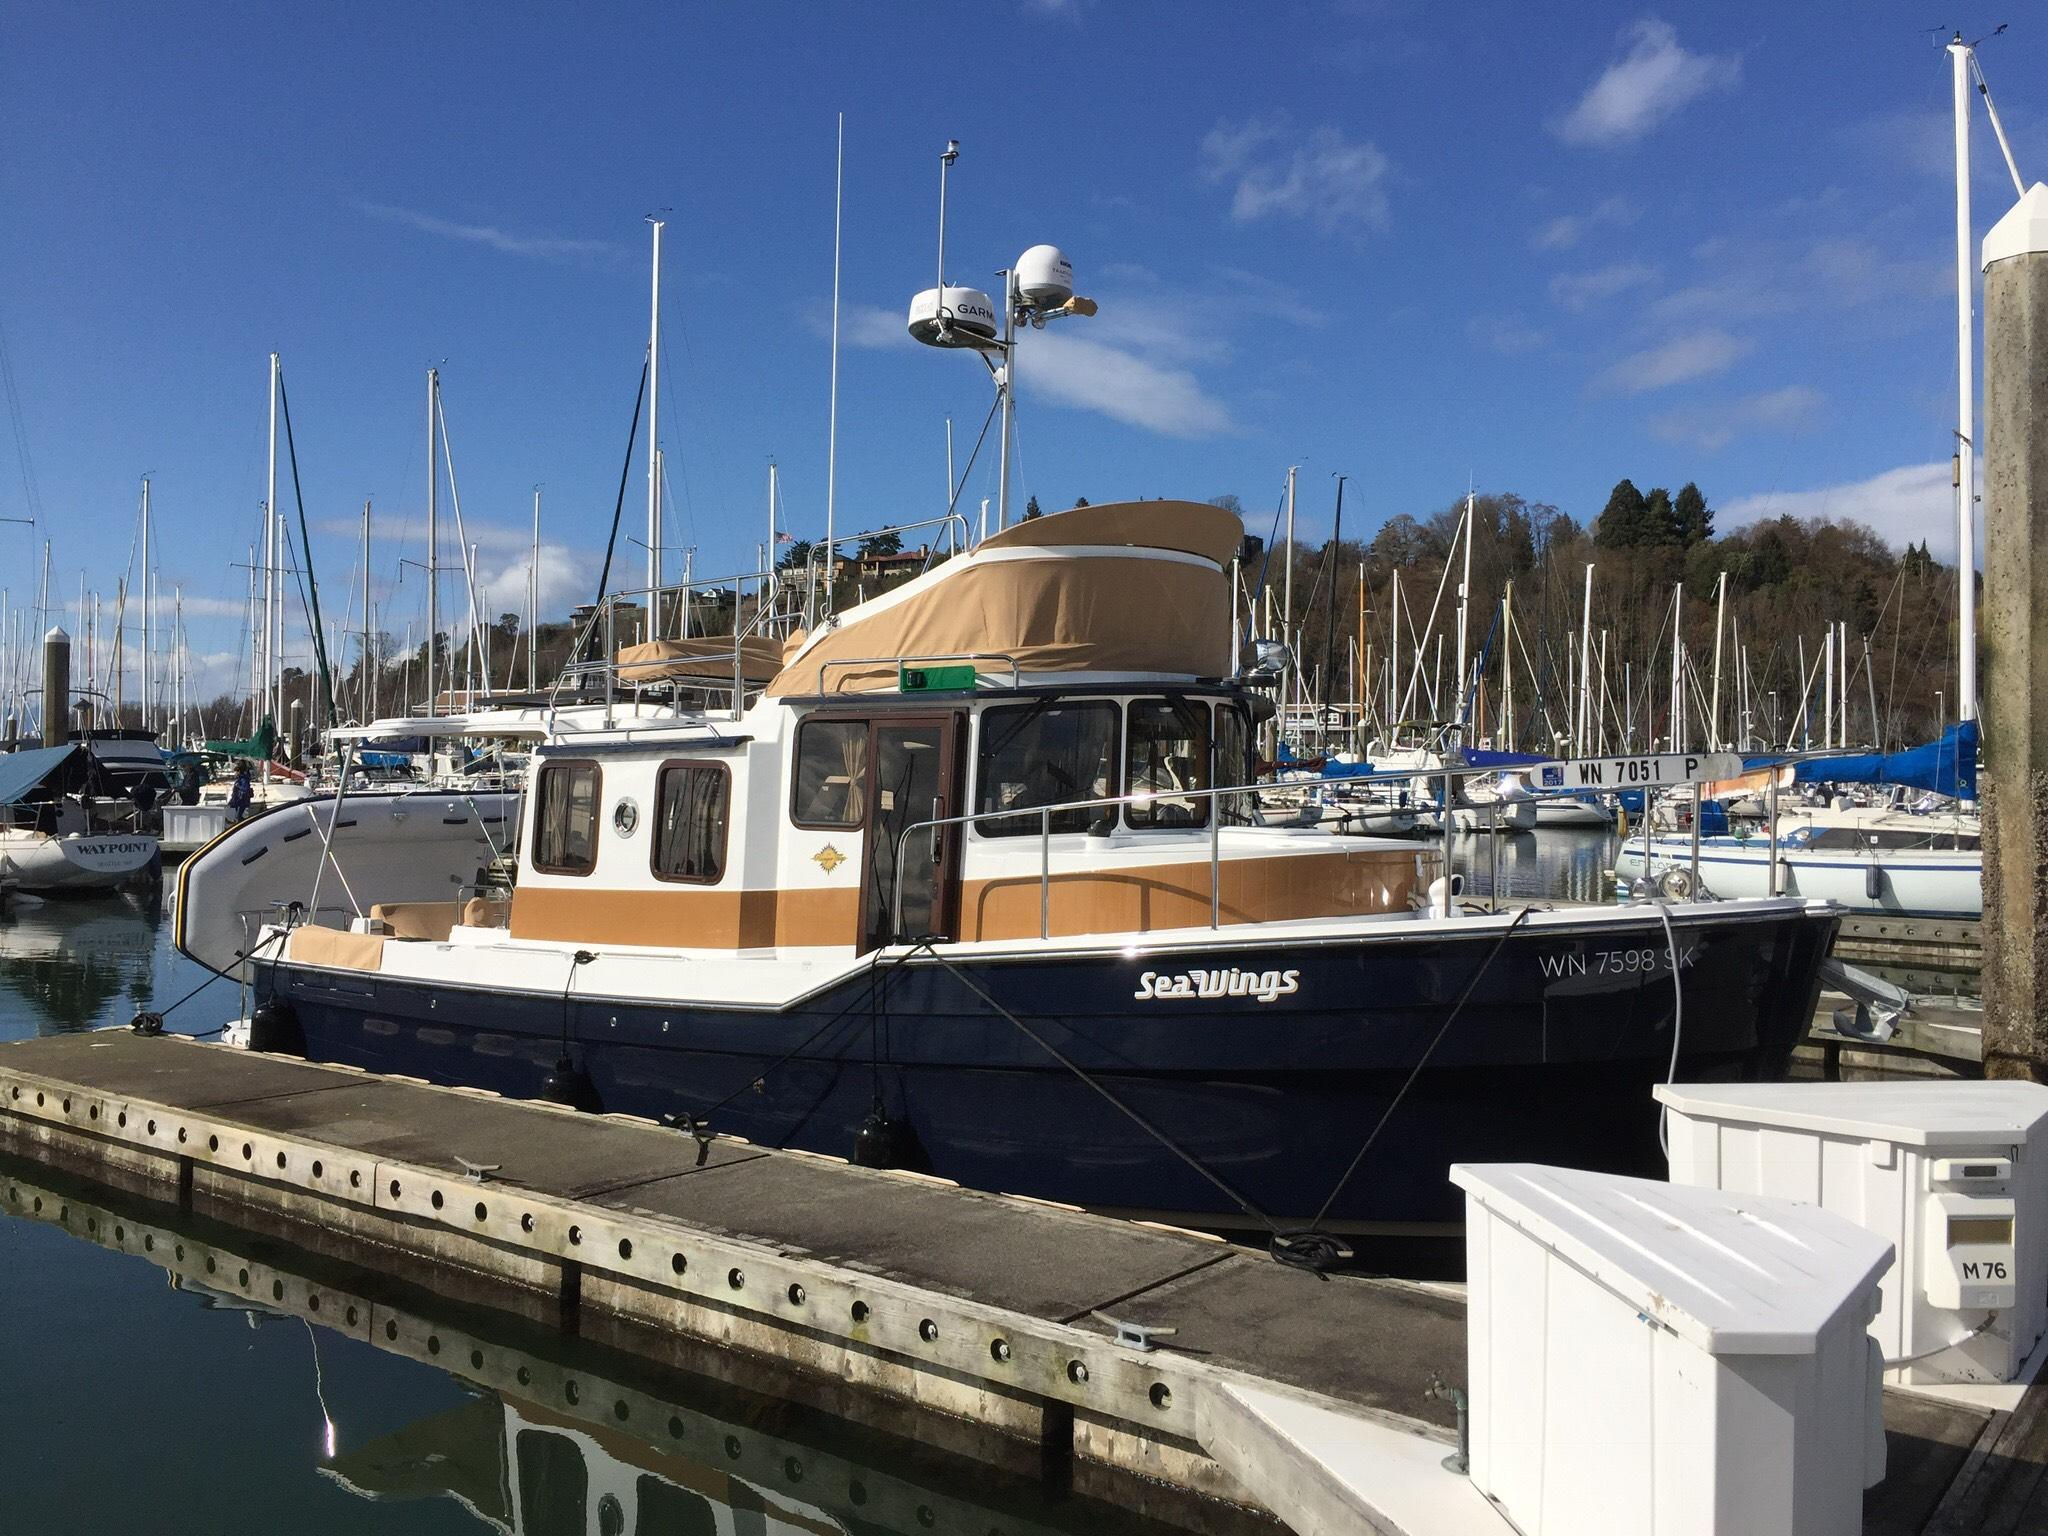 2017 Ranger Tugs R-31 CB Seattle, Washington - Irwin Yacht Sales